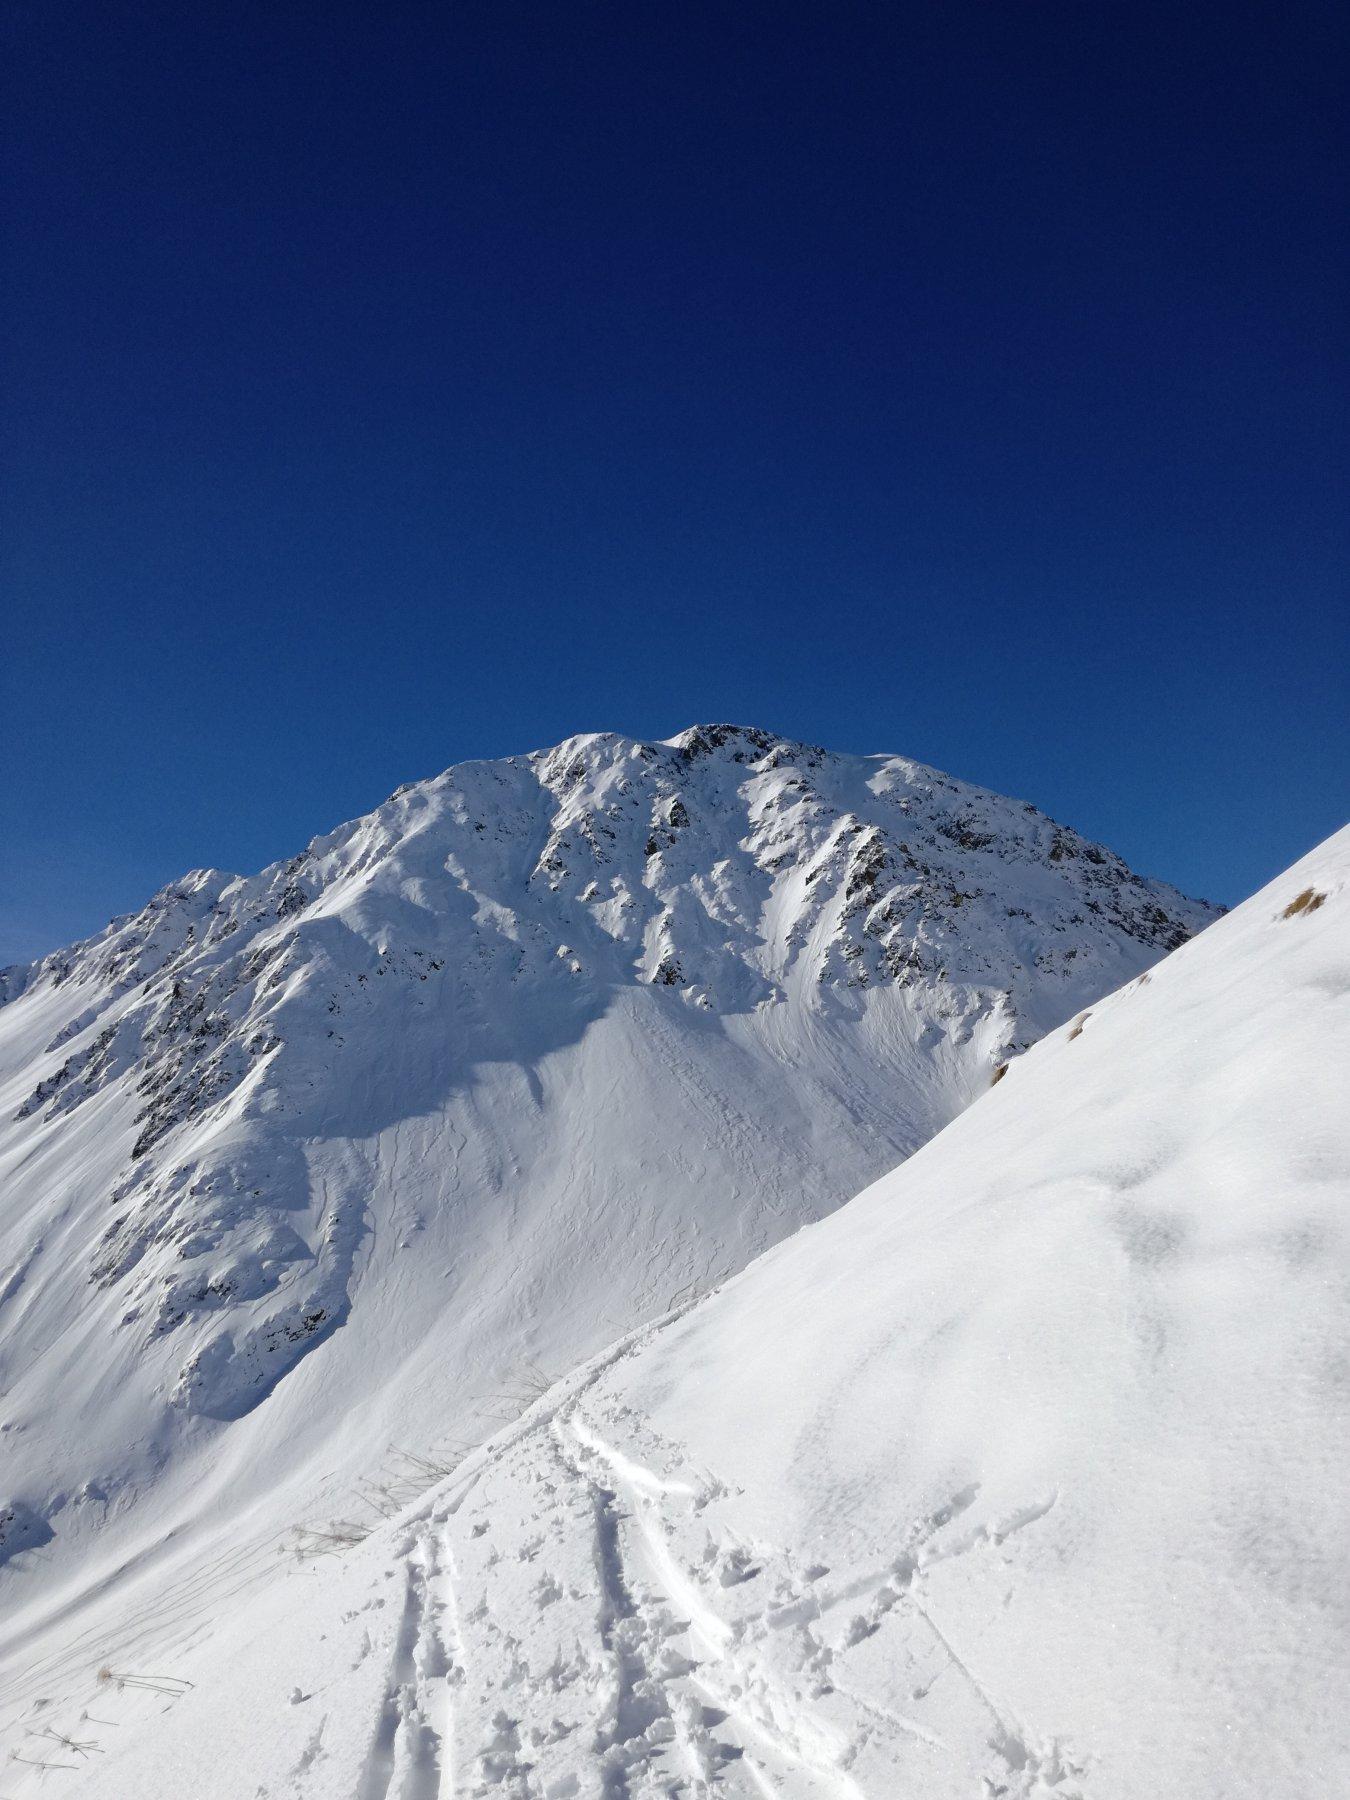 Pebrun (Monte) Canale NO 2018-01-28